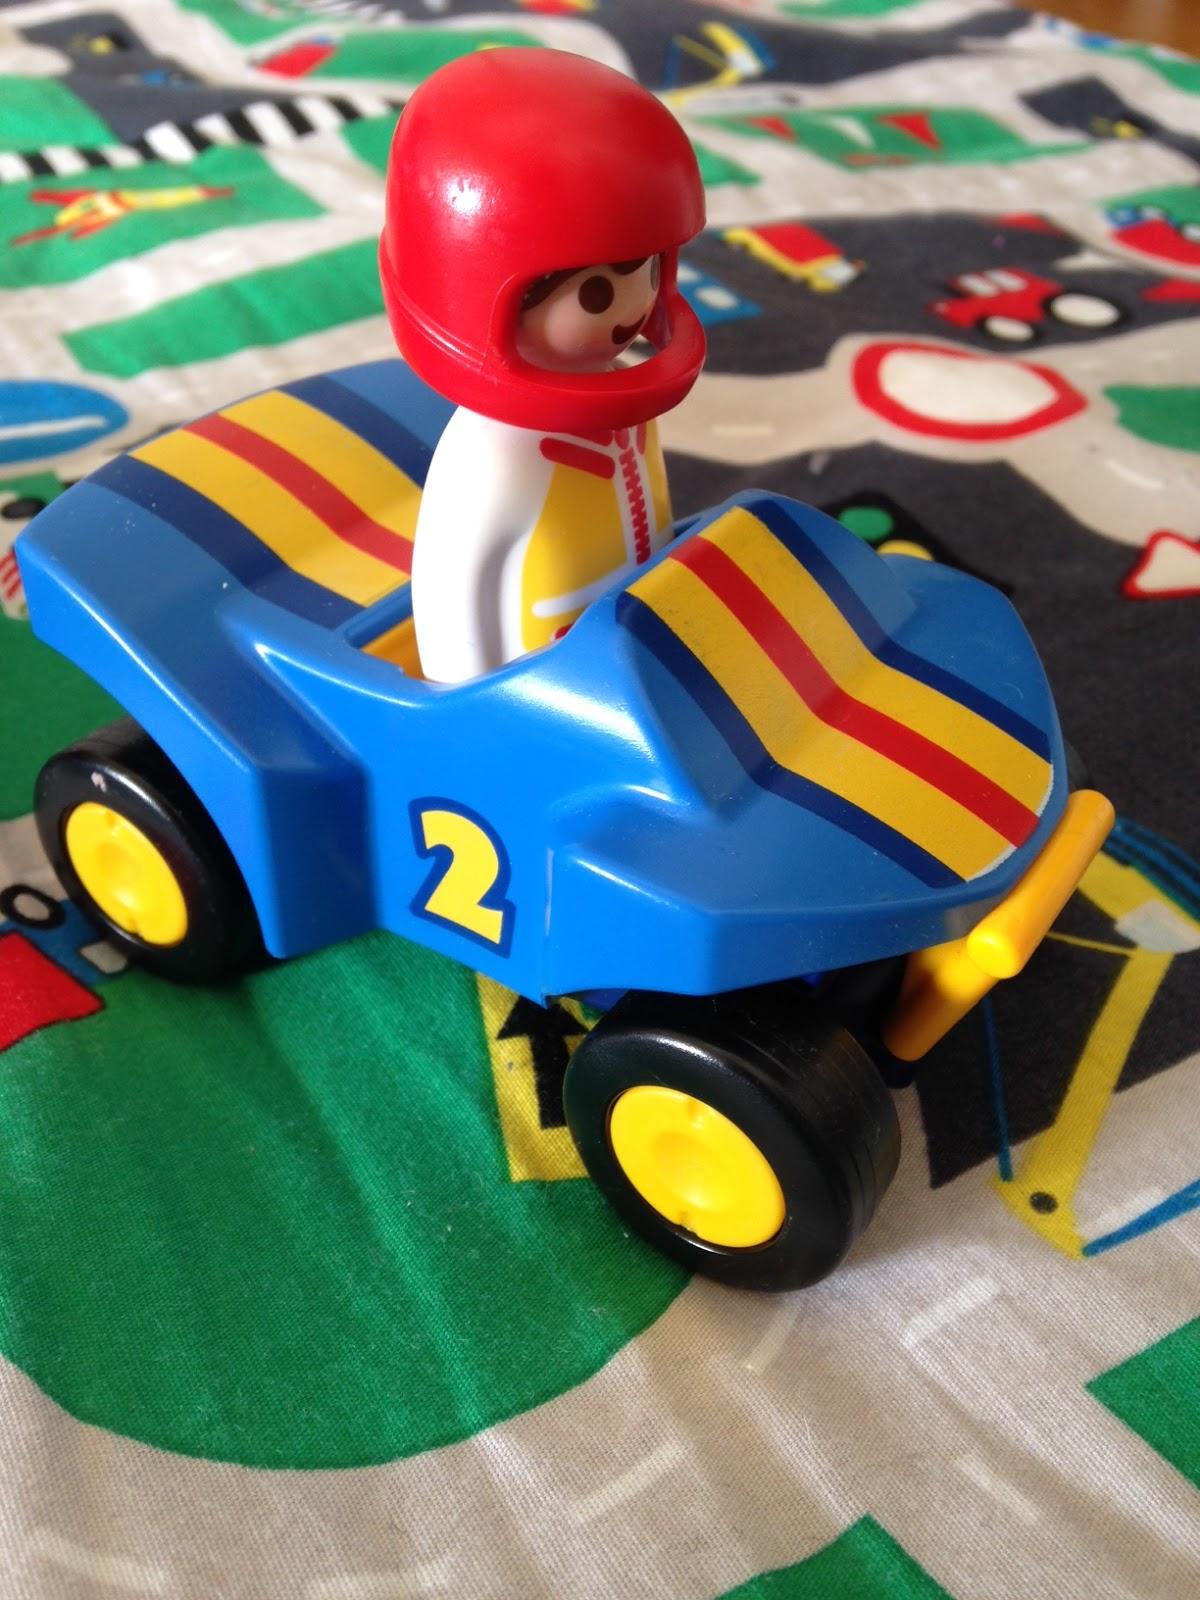 Playmobil 1 2 3 pas cher à prix Auchan